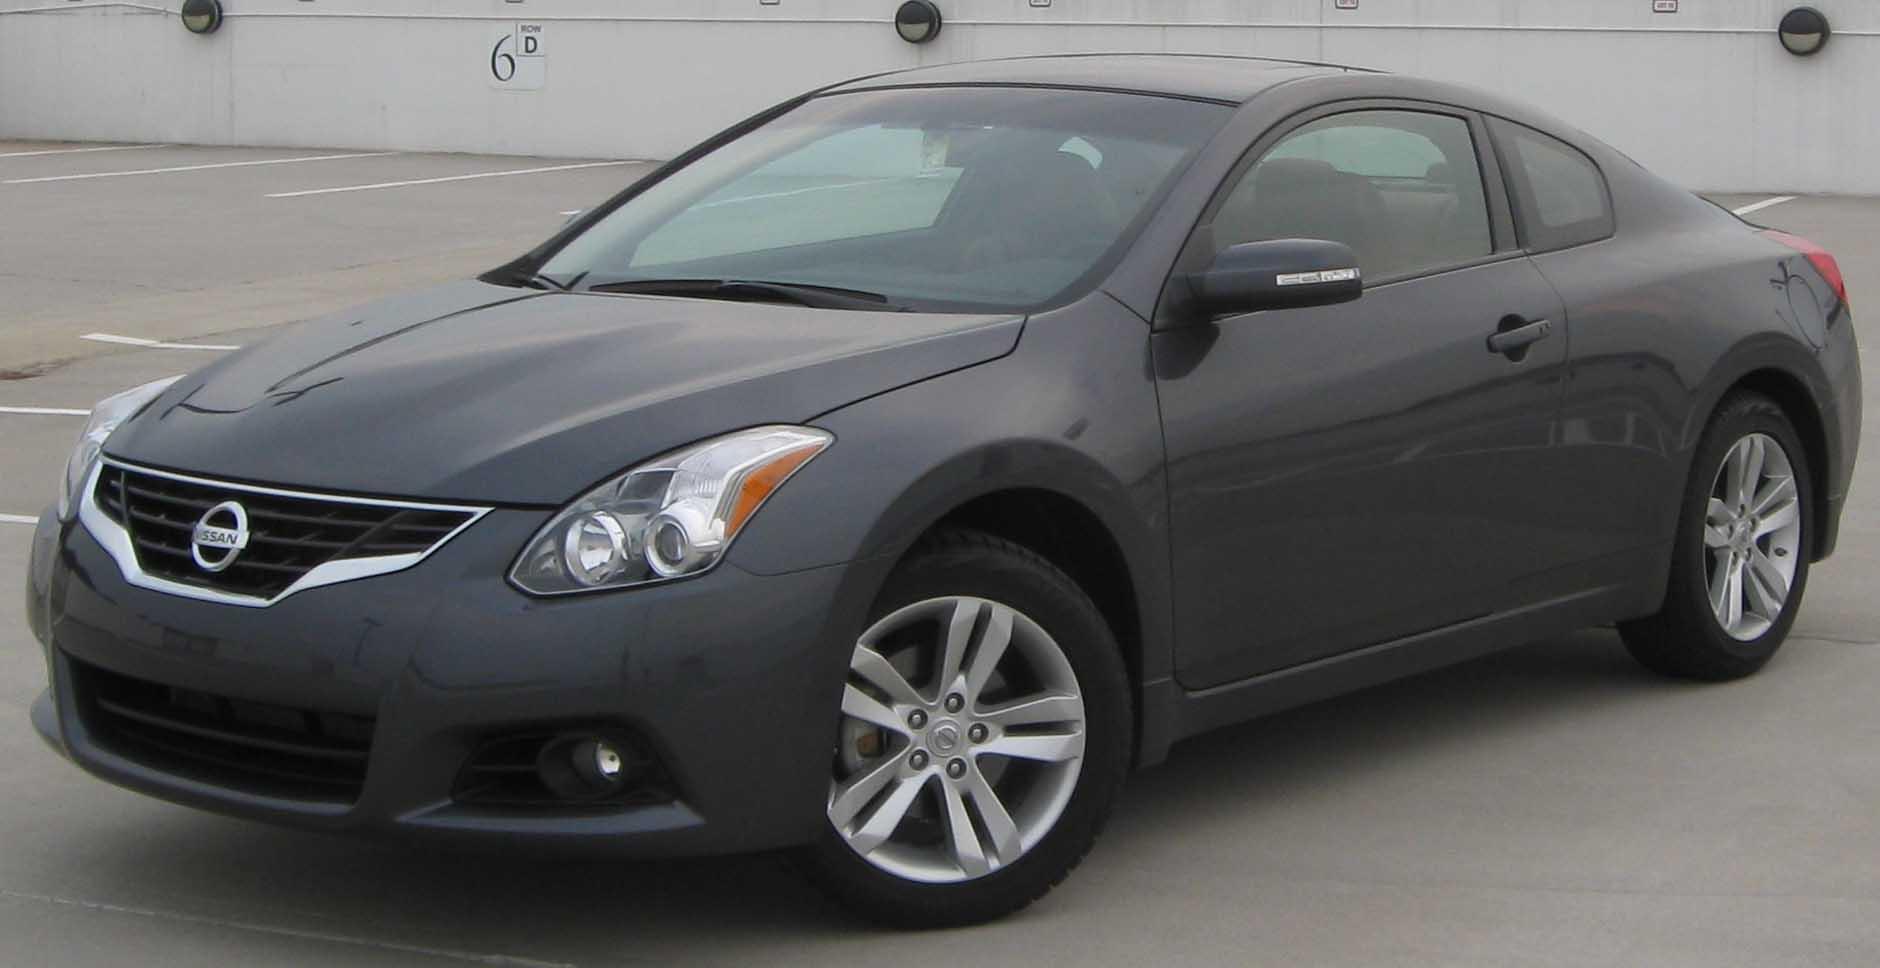 Nissan Altima Used Car Price